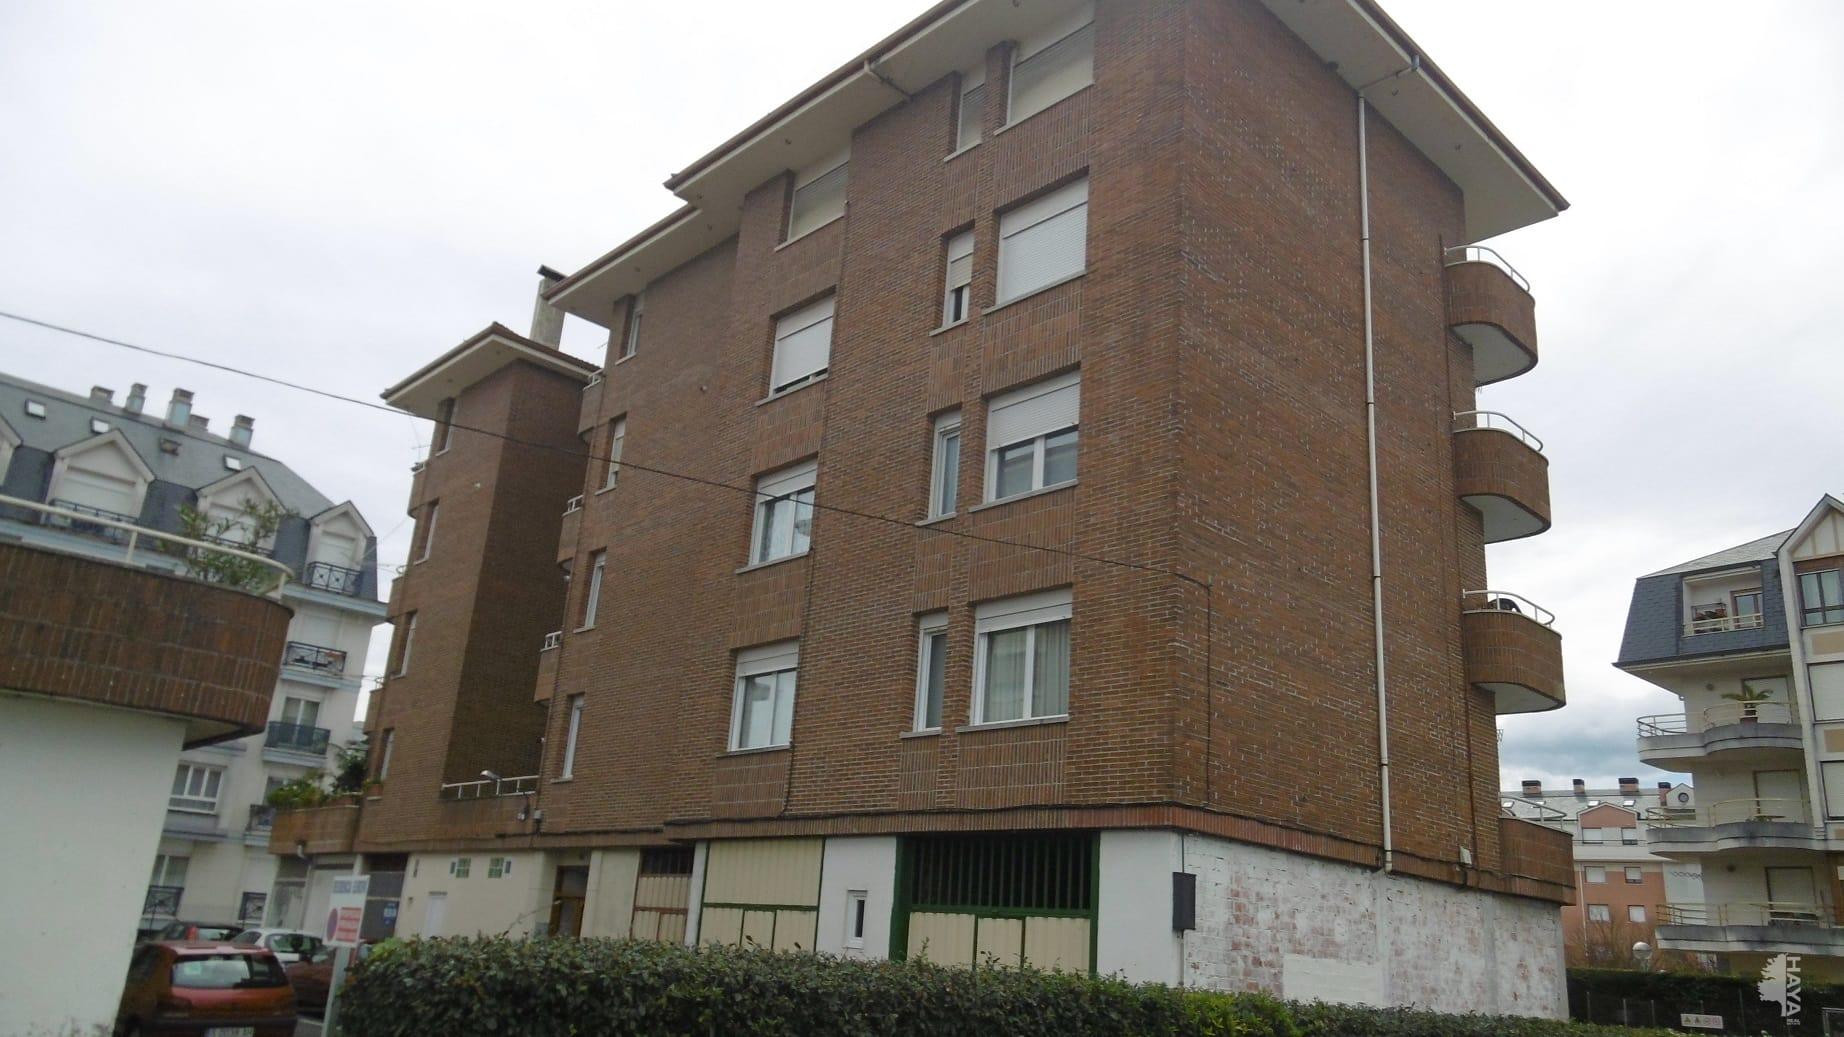 Oficina en venta en Barrio Chino, Colindres, Cantabria, Calle Sol, 24.700 €, 27 m2